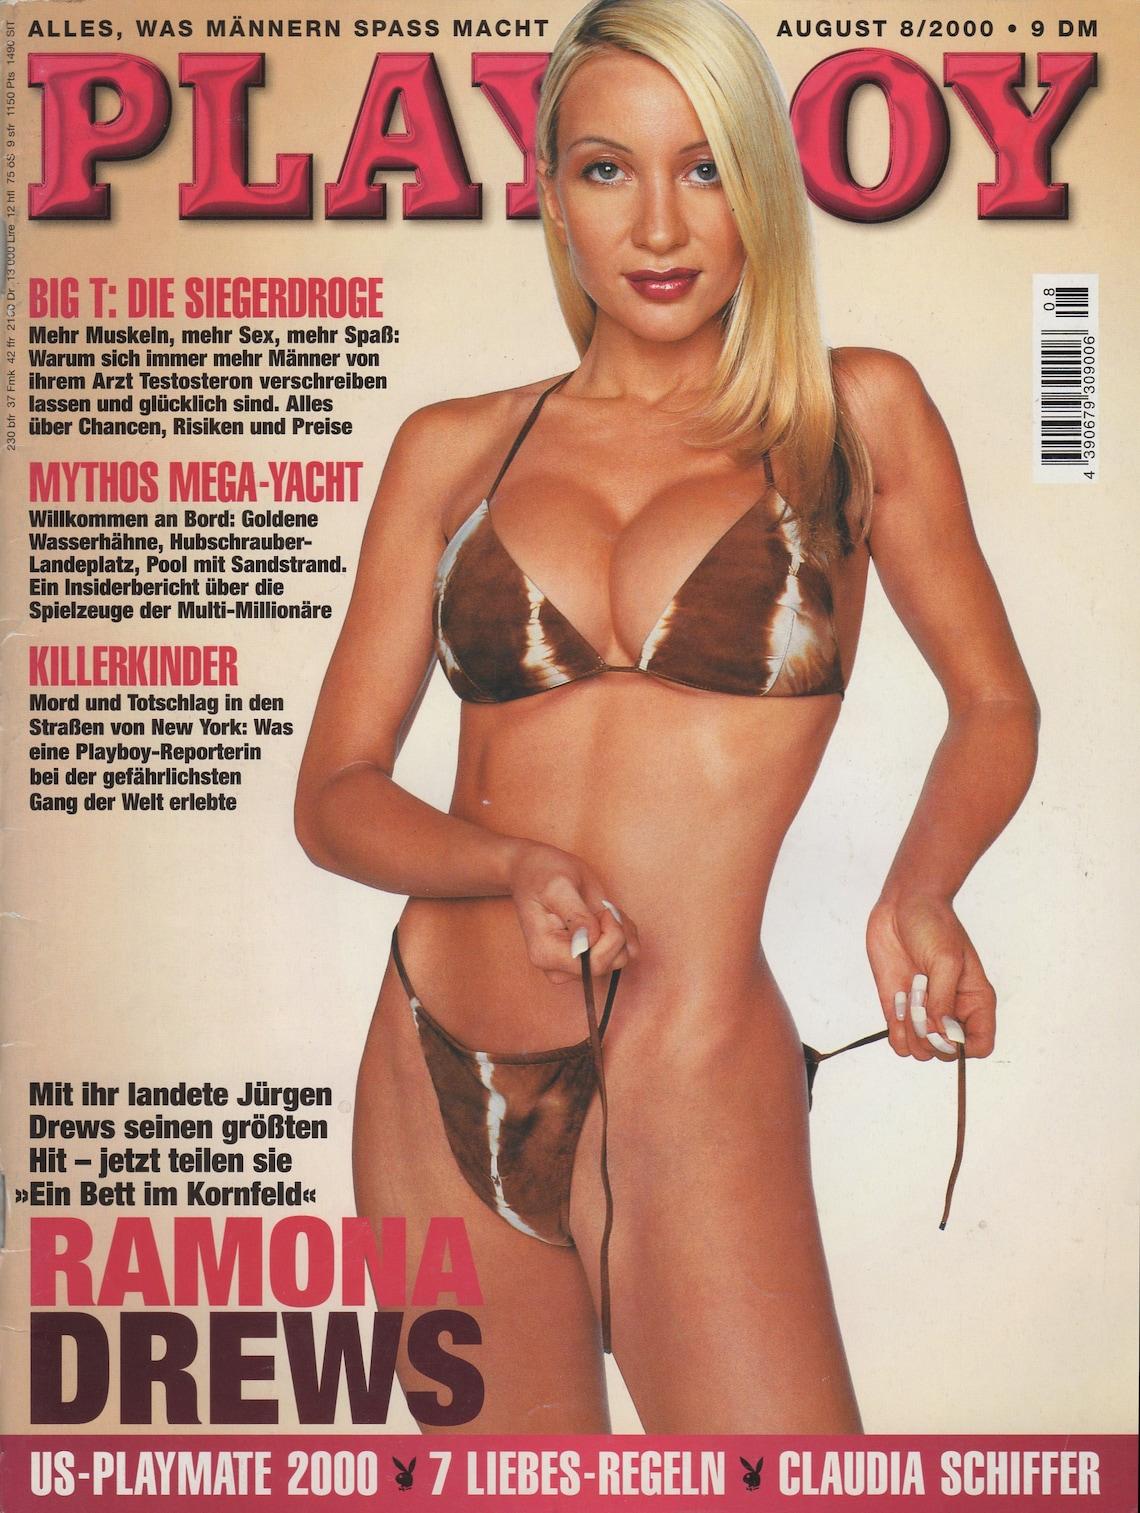 PLAYBOY Magazin August 2000 / German Edition / Erotik   Etsy